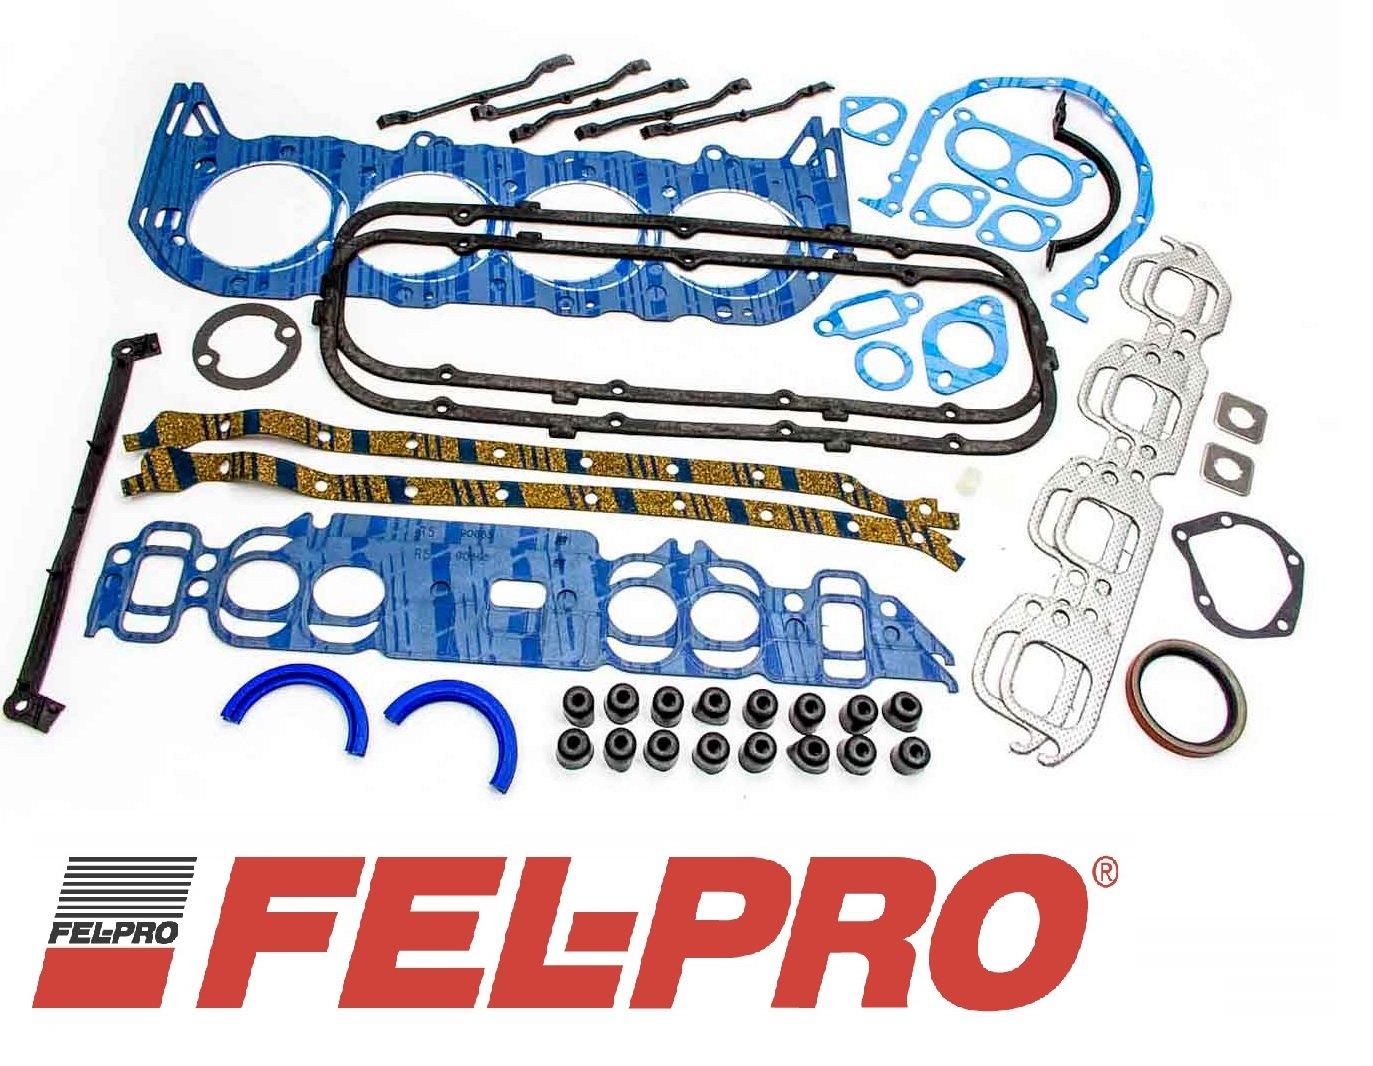 Fel Pro Engine Overhaul Gasket Set 1980-1985 Chevy bb TRUCK 7.4L 454 & 1974-1985 427 (BBC 427 454)